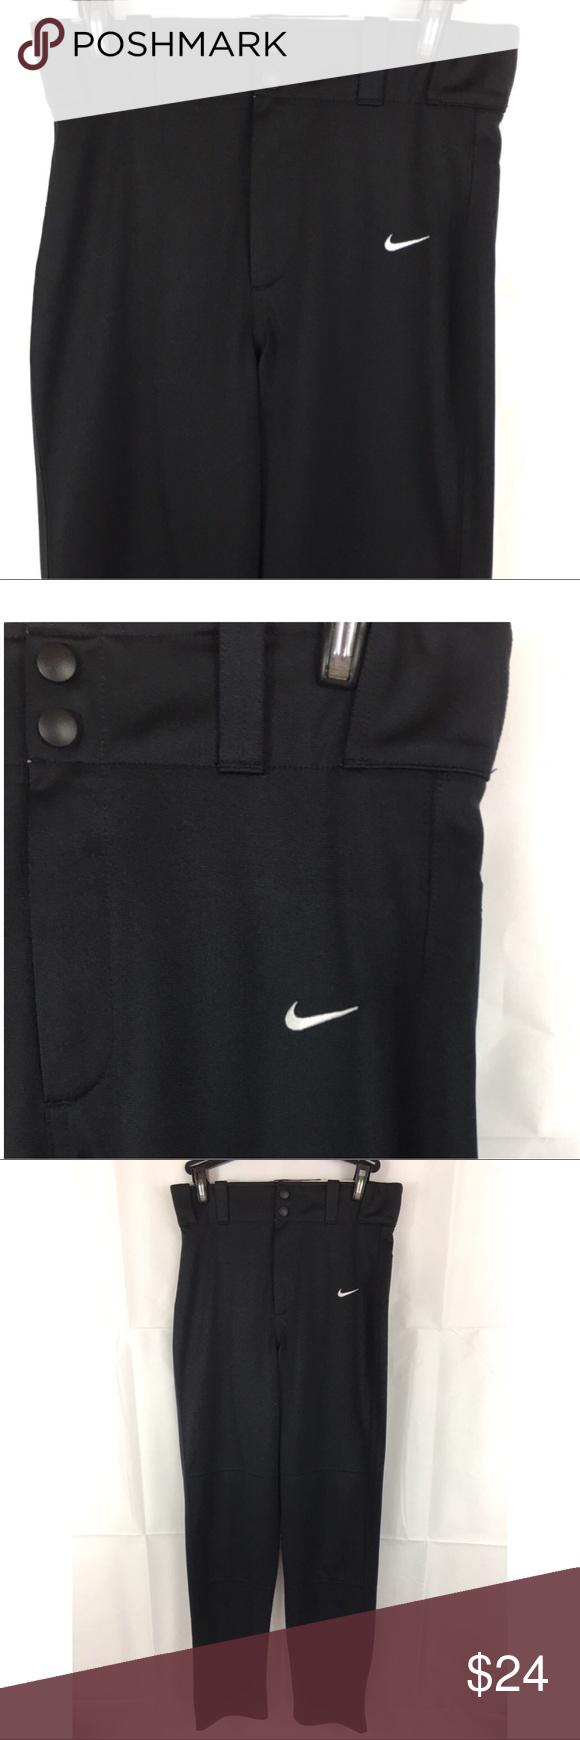 12d12cb84 Nike Core Baseball Pants Boys XL Nike Core dri fit open hem baseball pants  boys youth